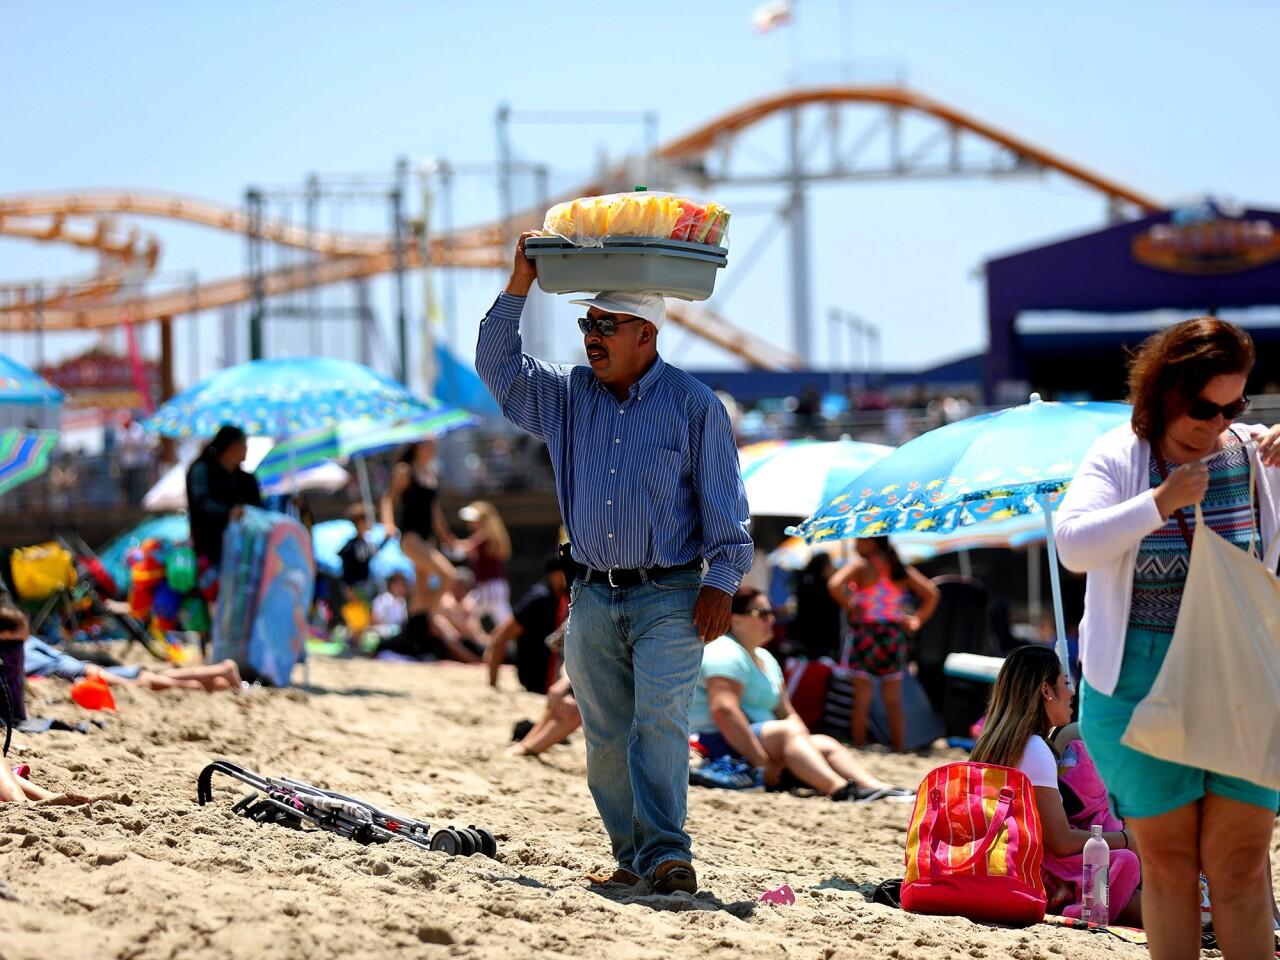 Santa Monica street vendors struggle amid new licensing rules